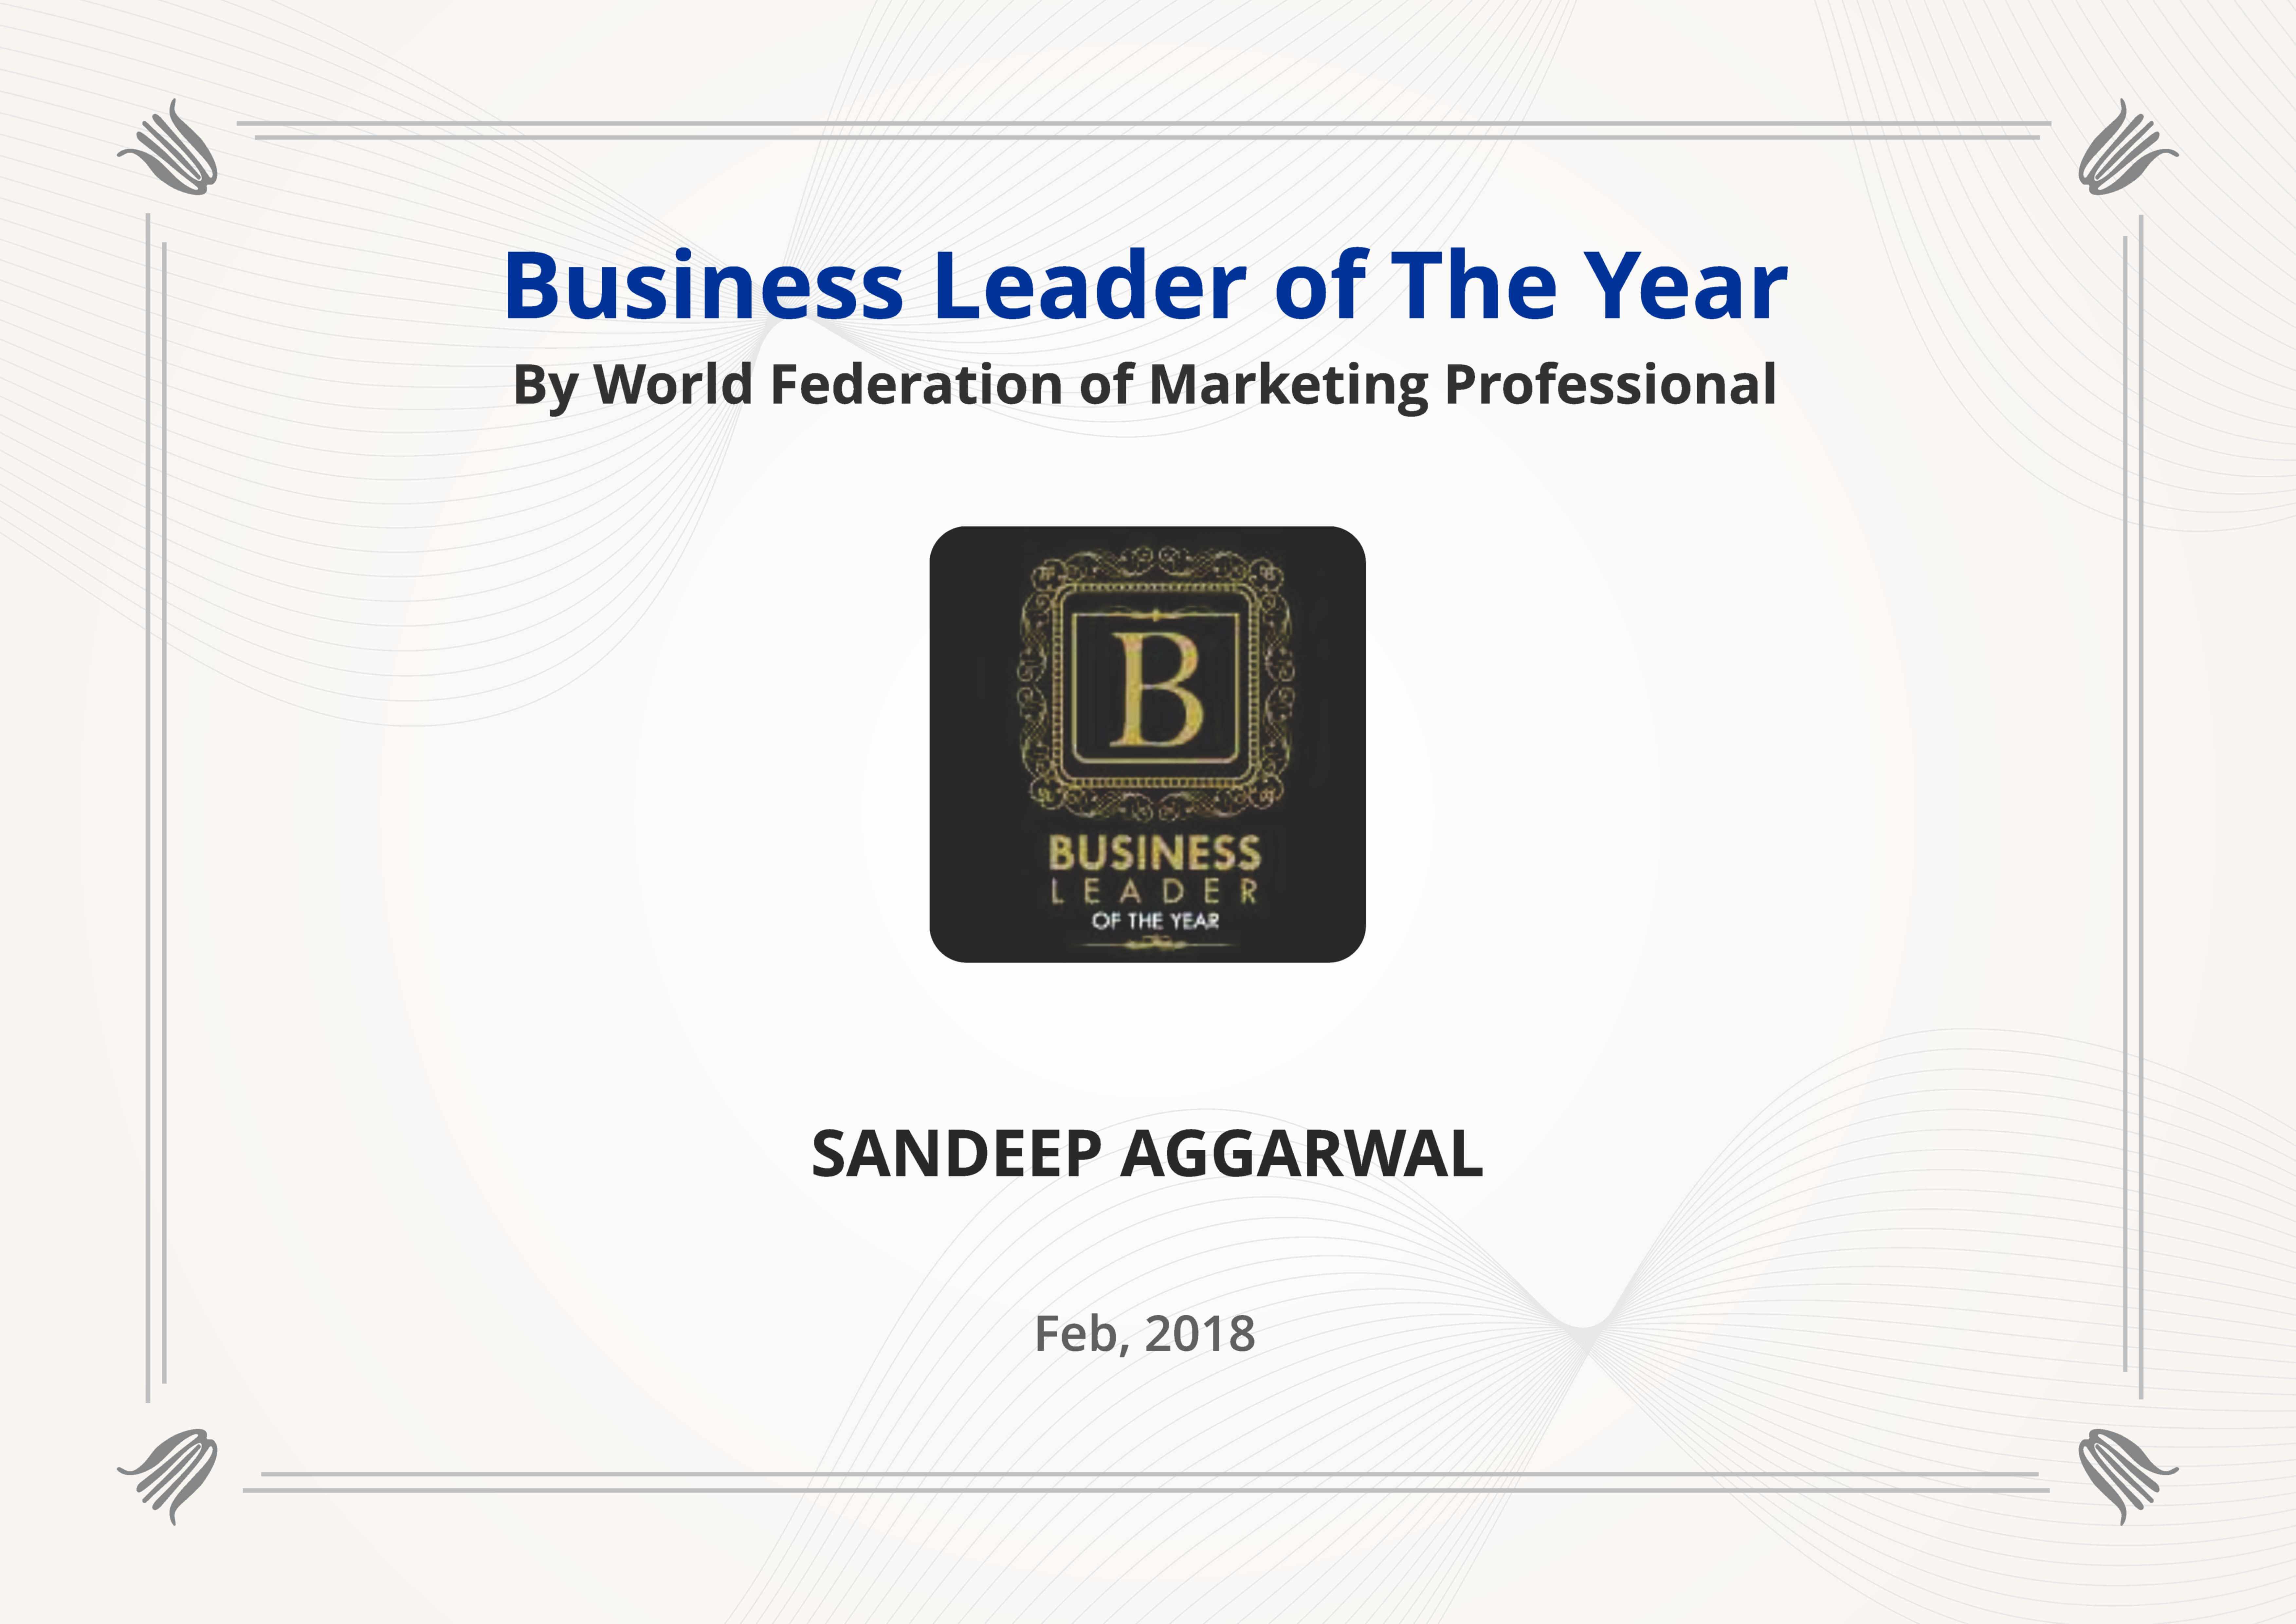 Business leader 2018